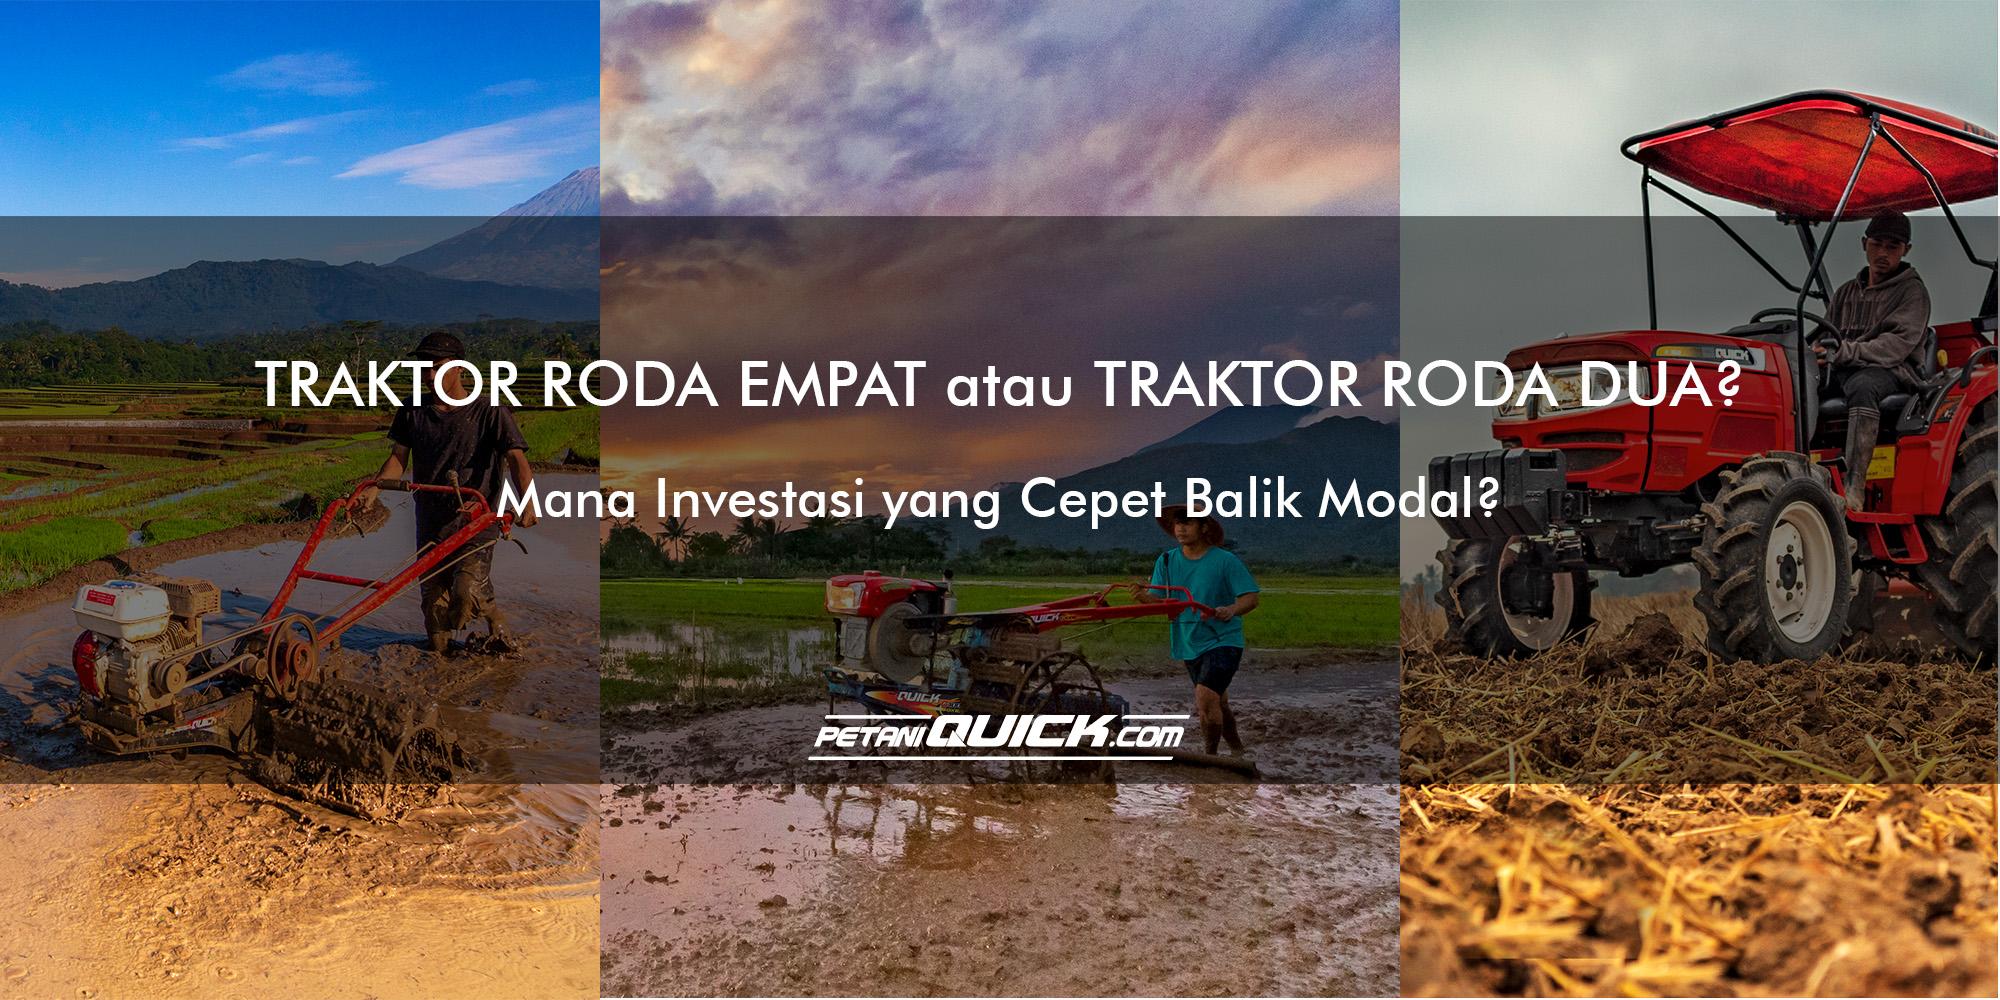 Template Thumbnail PetaniQuick Investasi Traktor